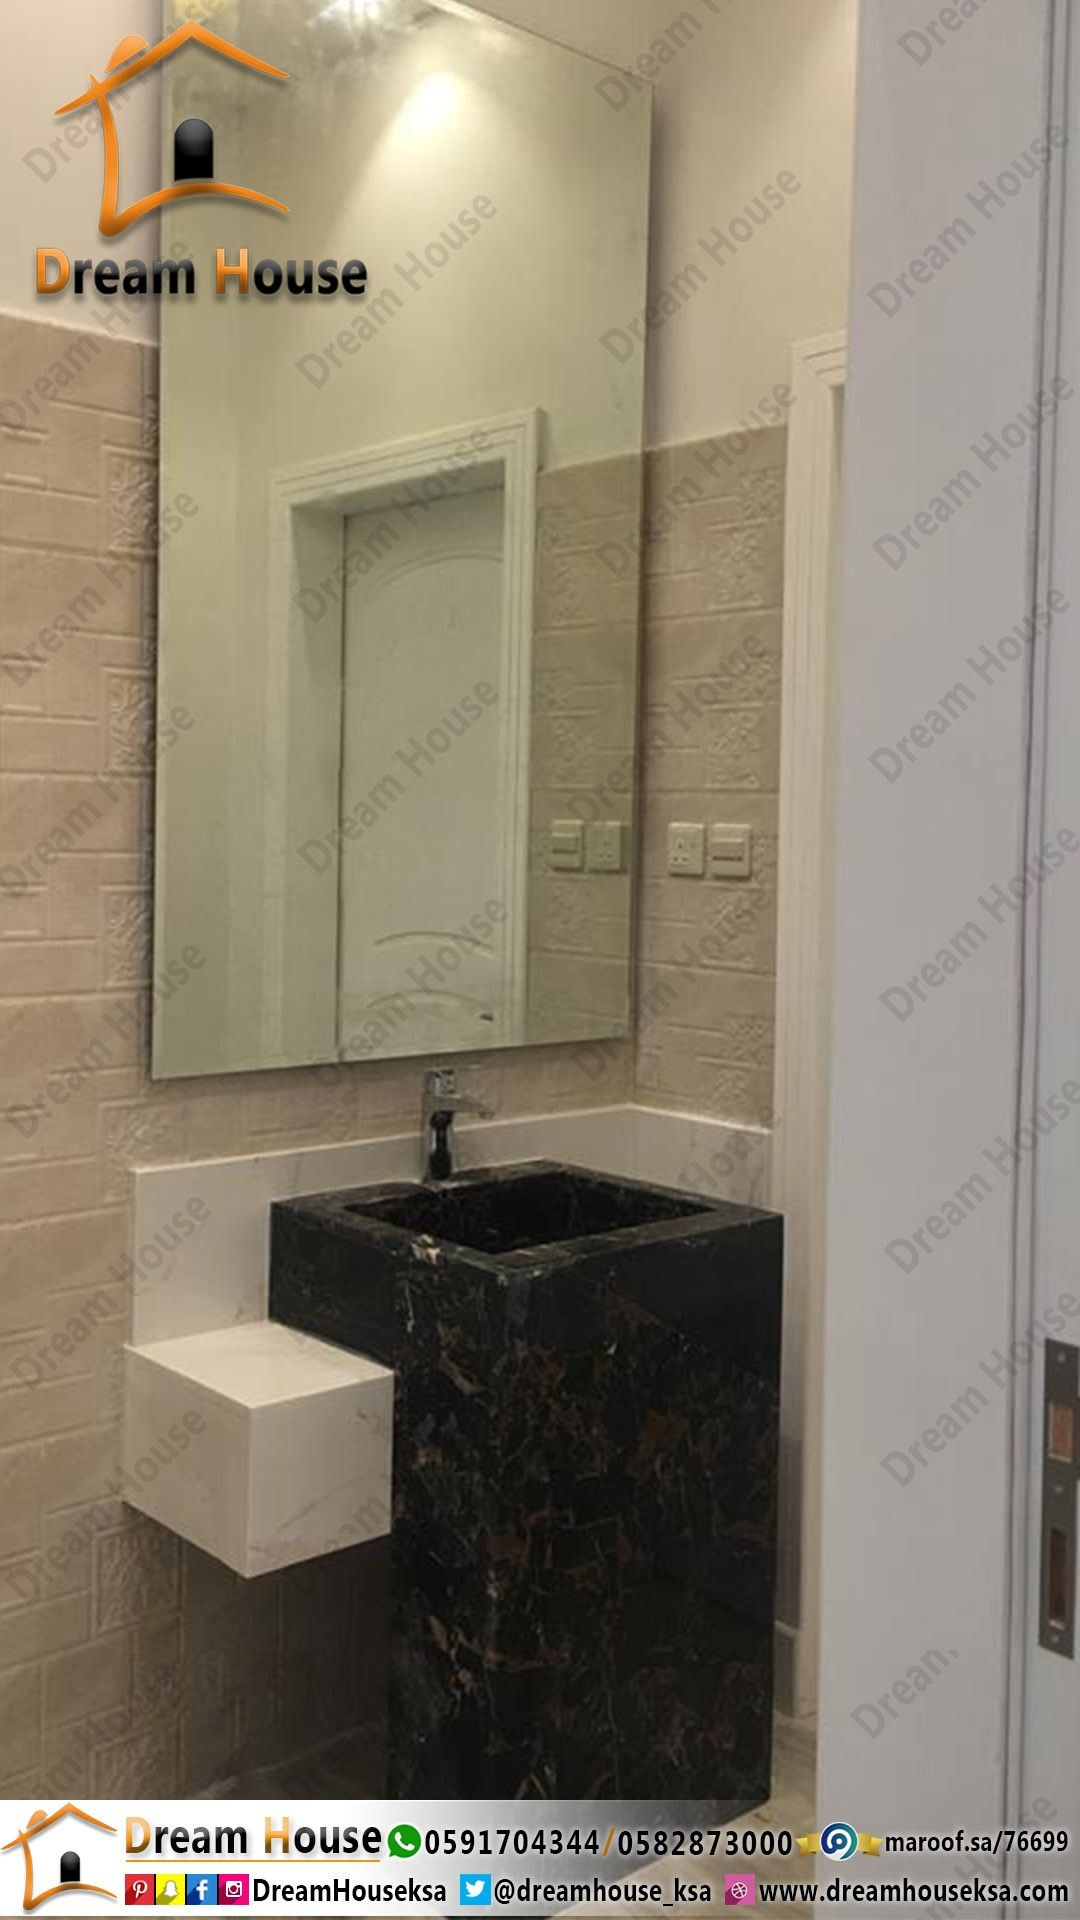 Pin By مغاسل منزل الاحلام On مغاسل رخام Bathroom Mirror Bathroom Lighting Lighted Bathroom Mirror